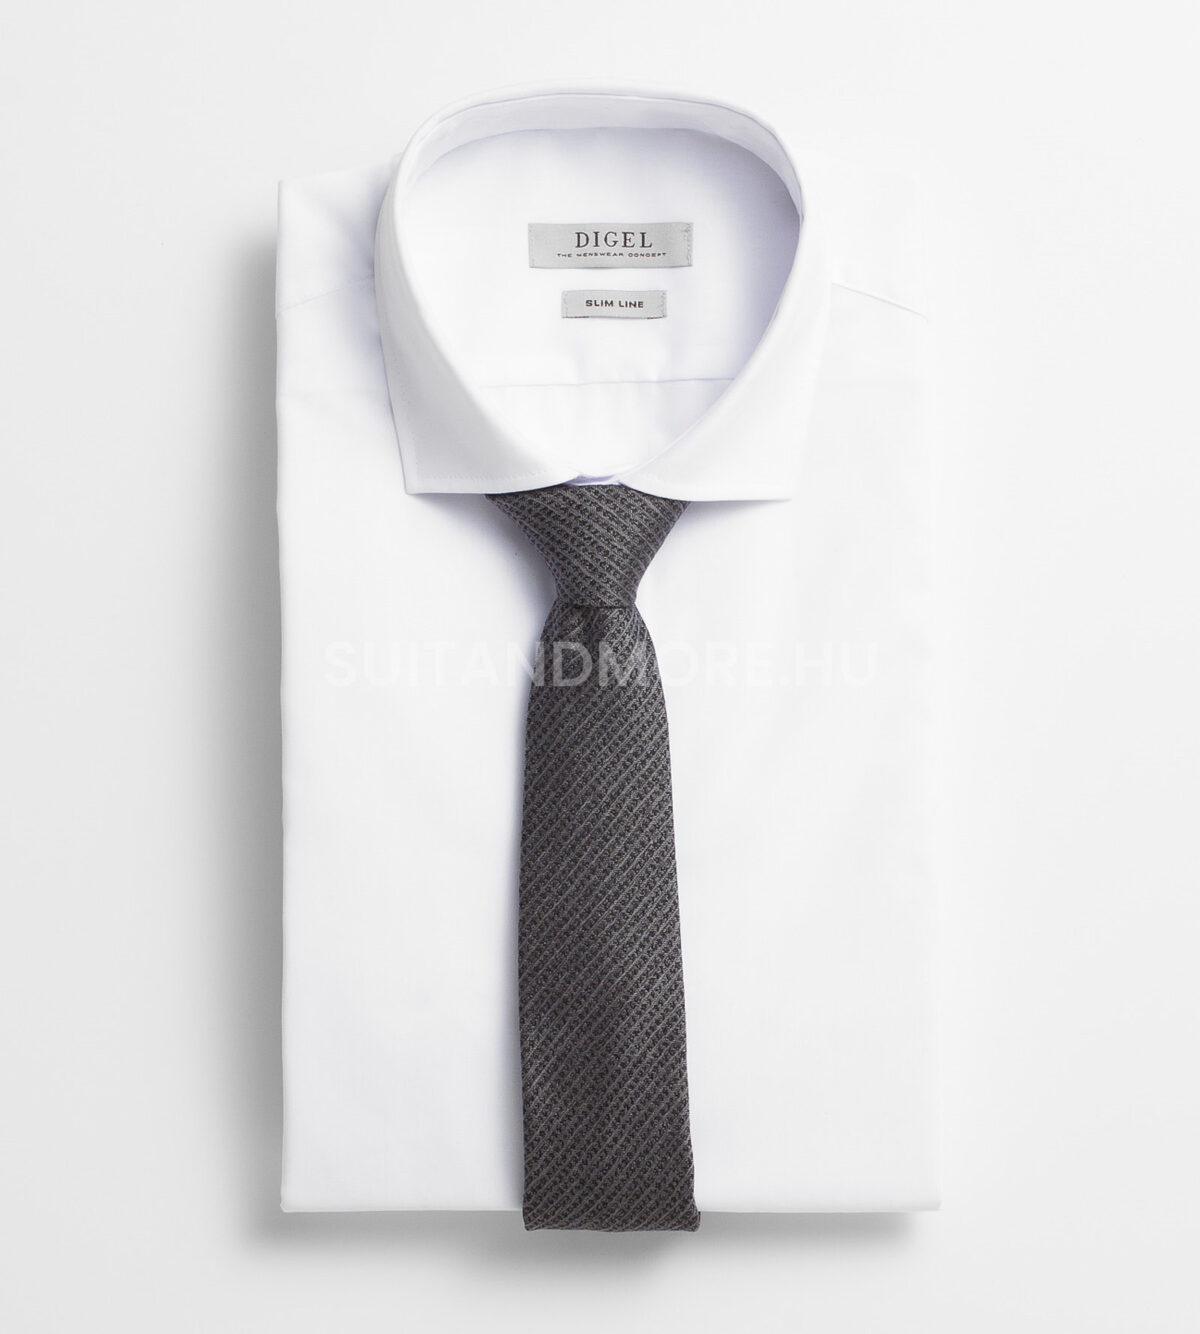 dunhill-strukturalt-sotetszurke-nyakkendo-dunhill-1269006-40-01